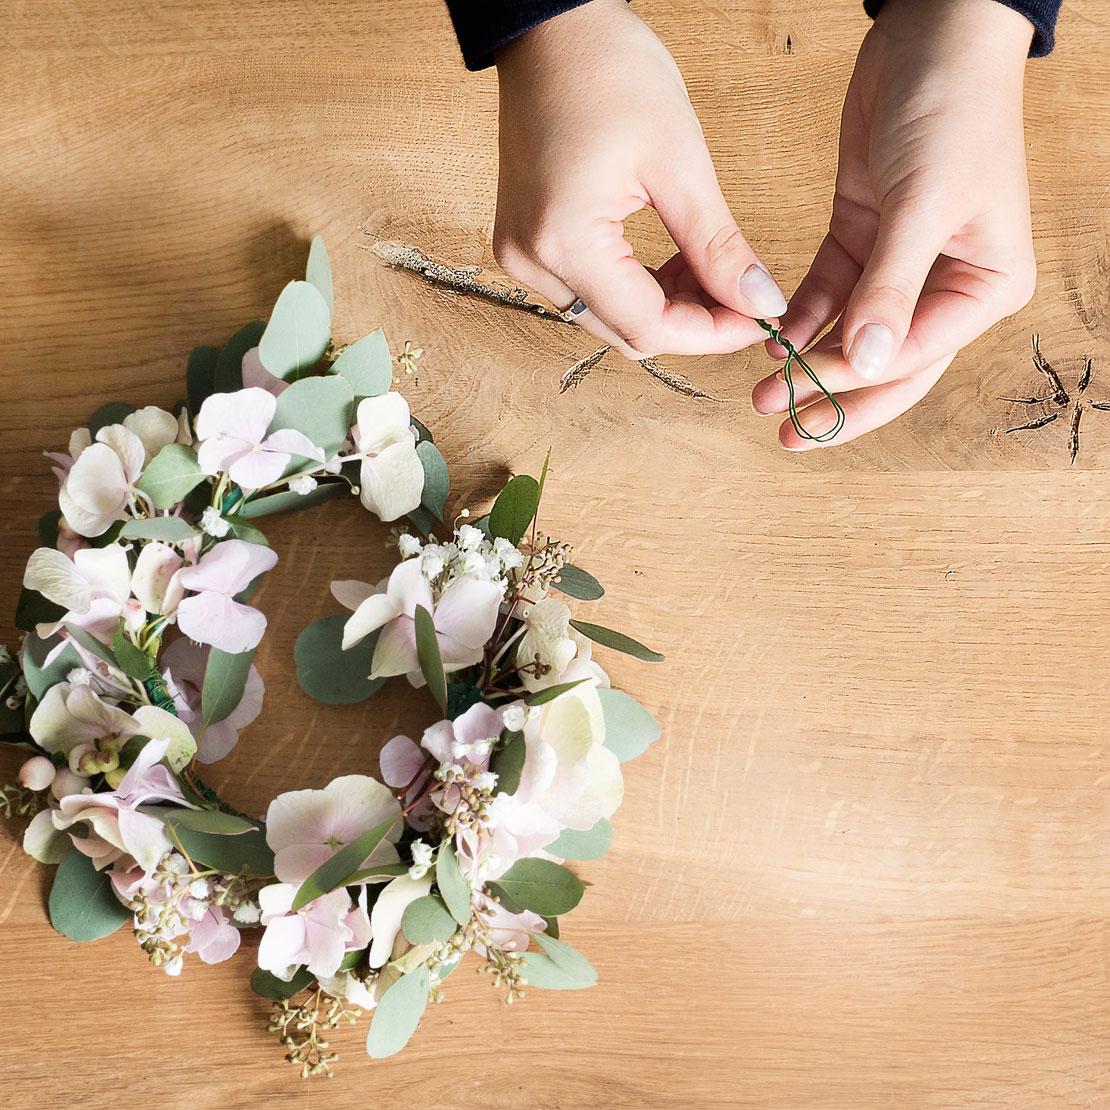 Ojales de alambre para corona de flores DIY